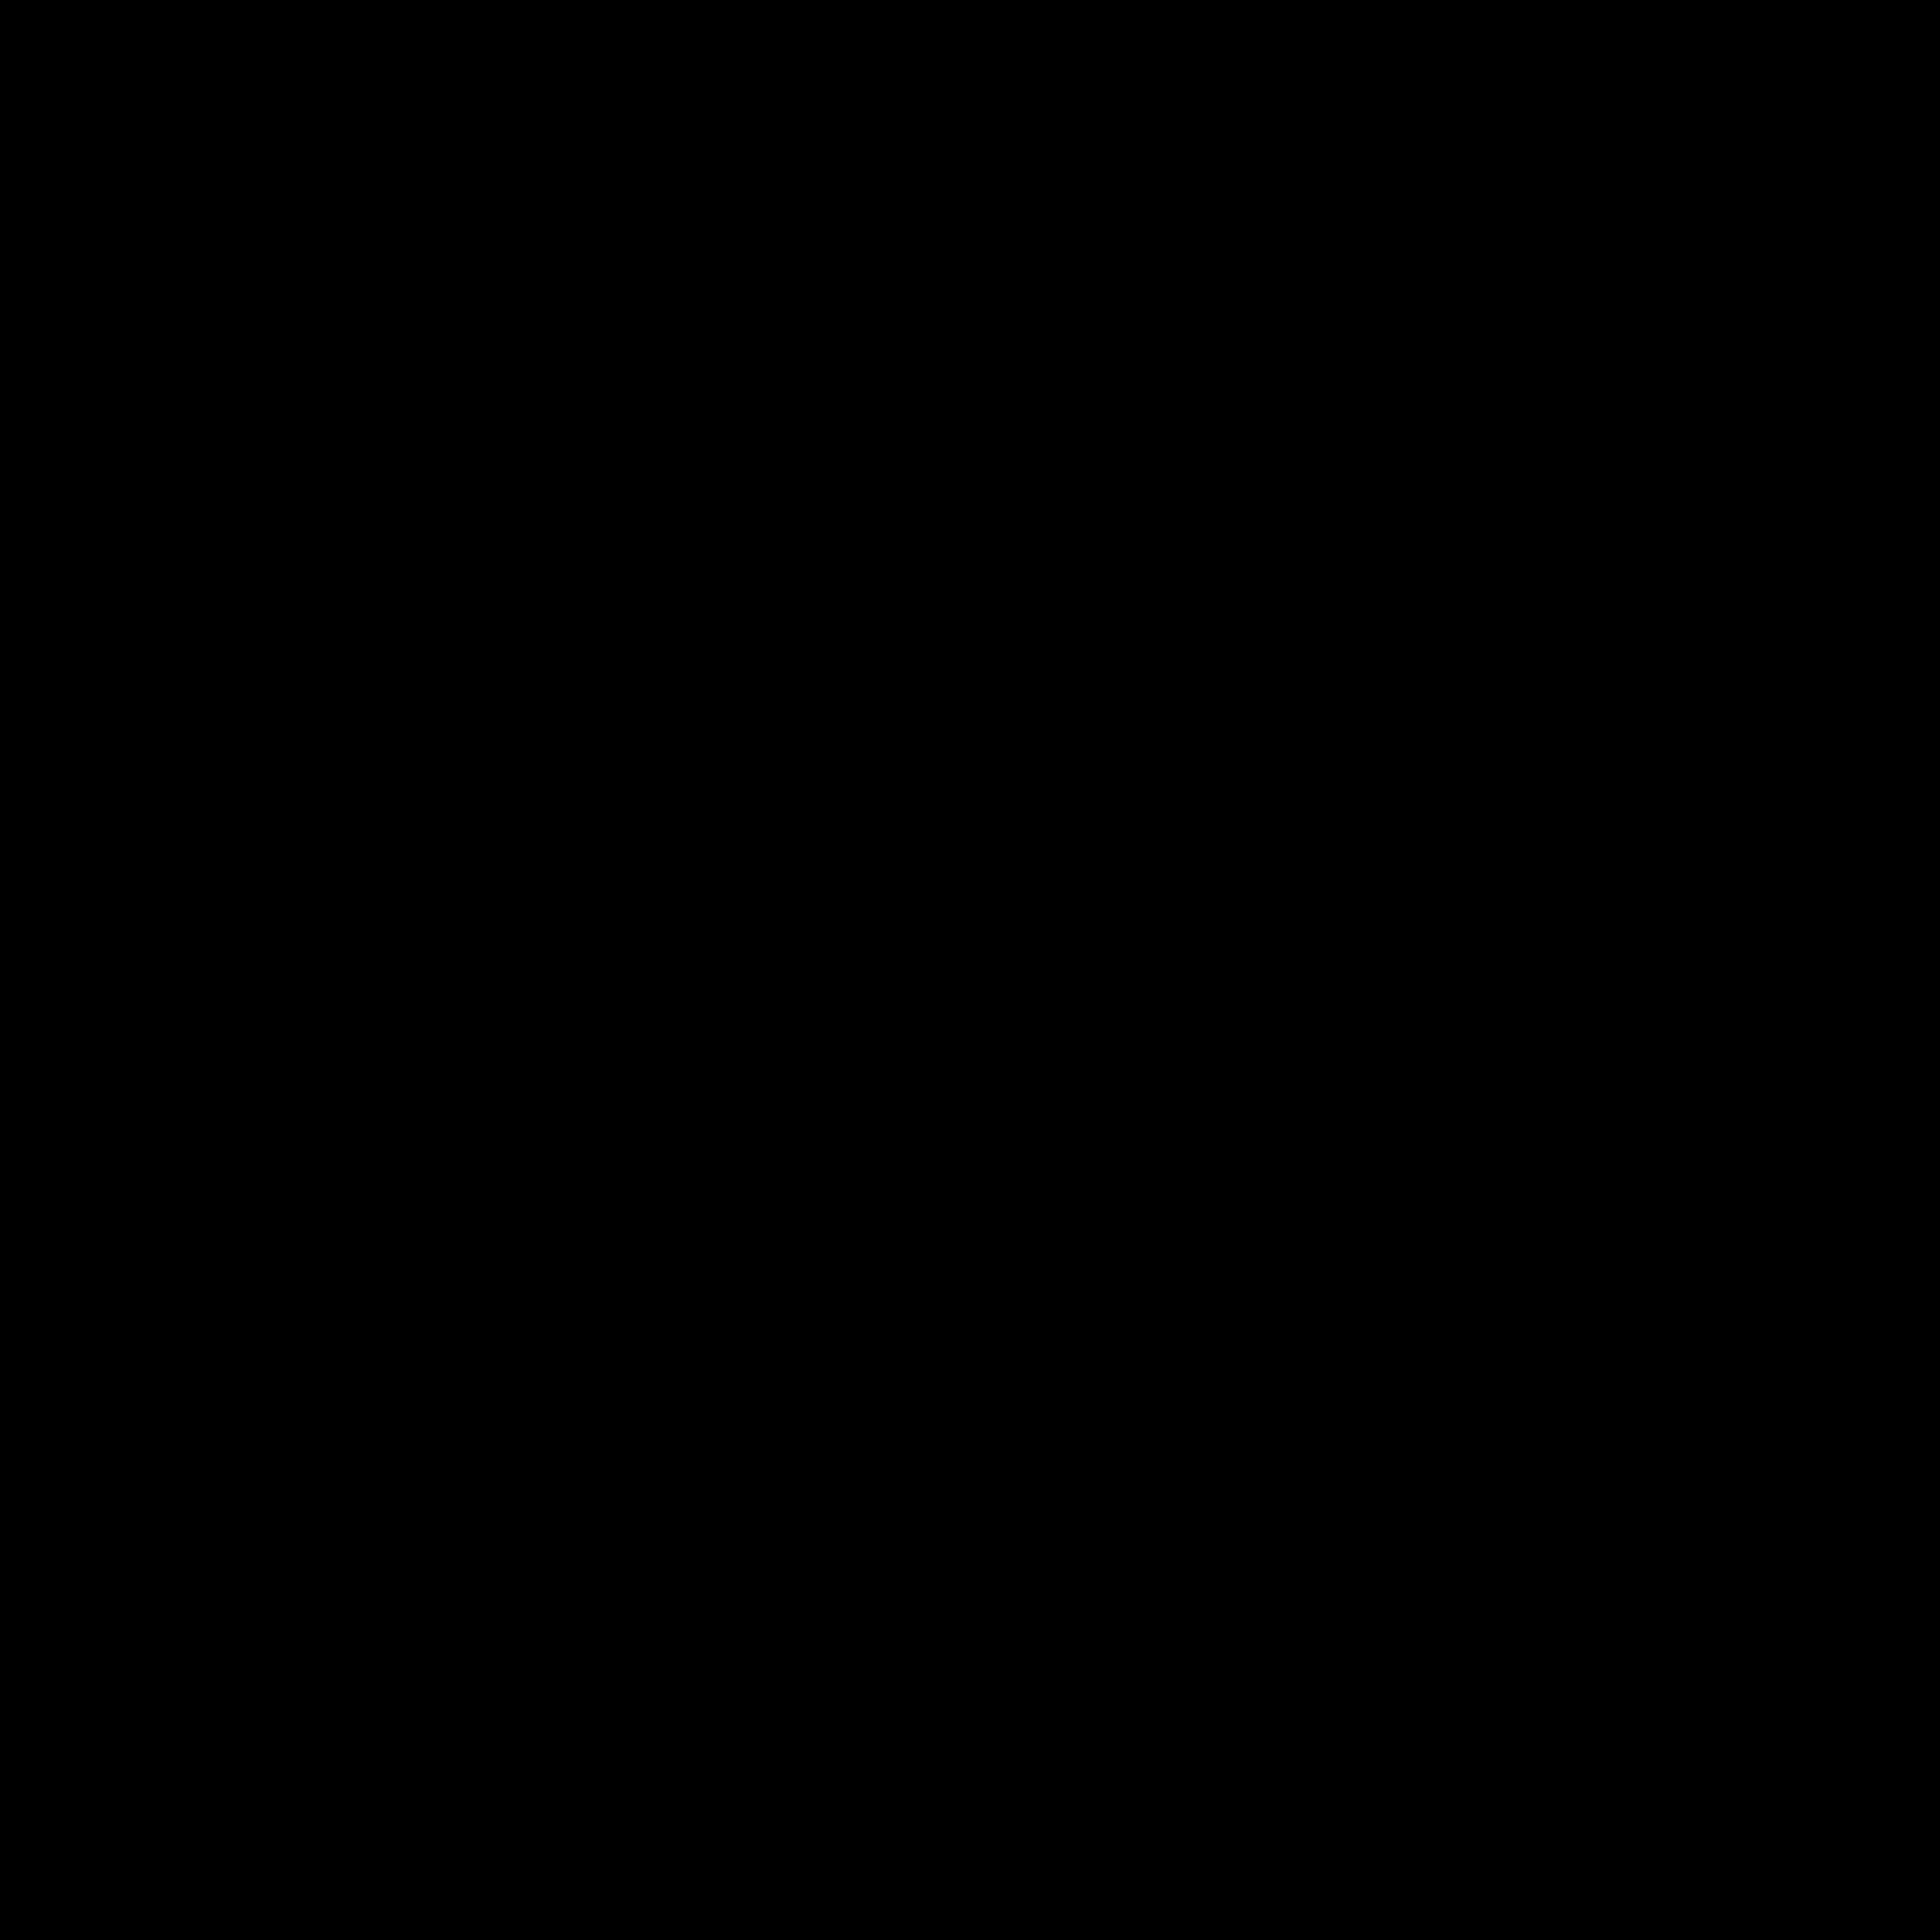 Planet clipart ring logo. Jupiter symbol google search